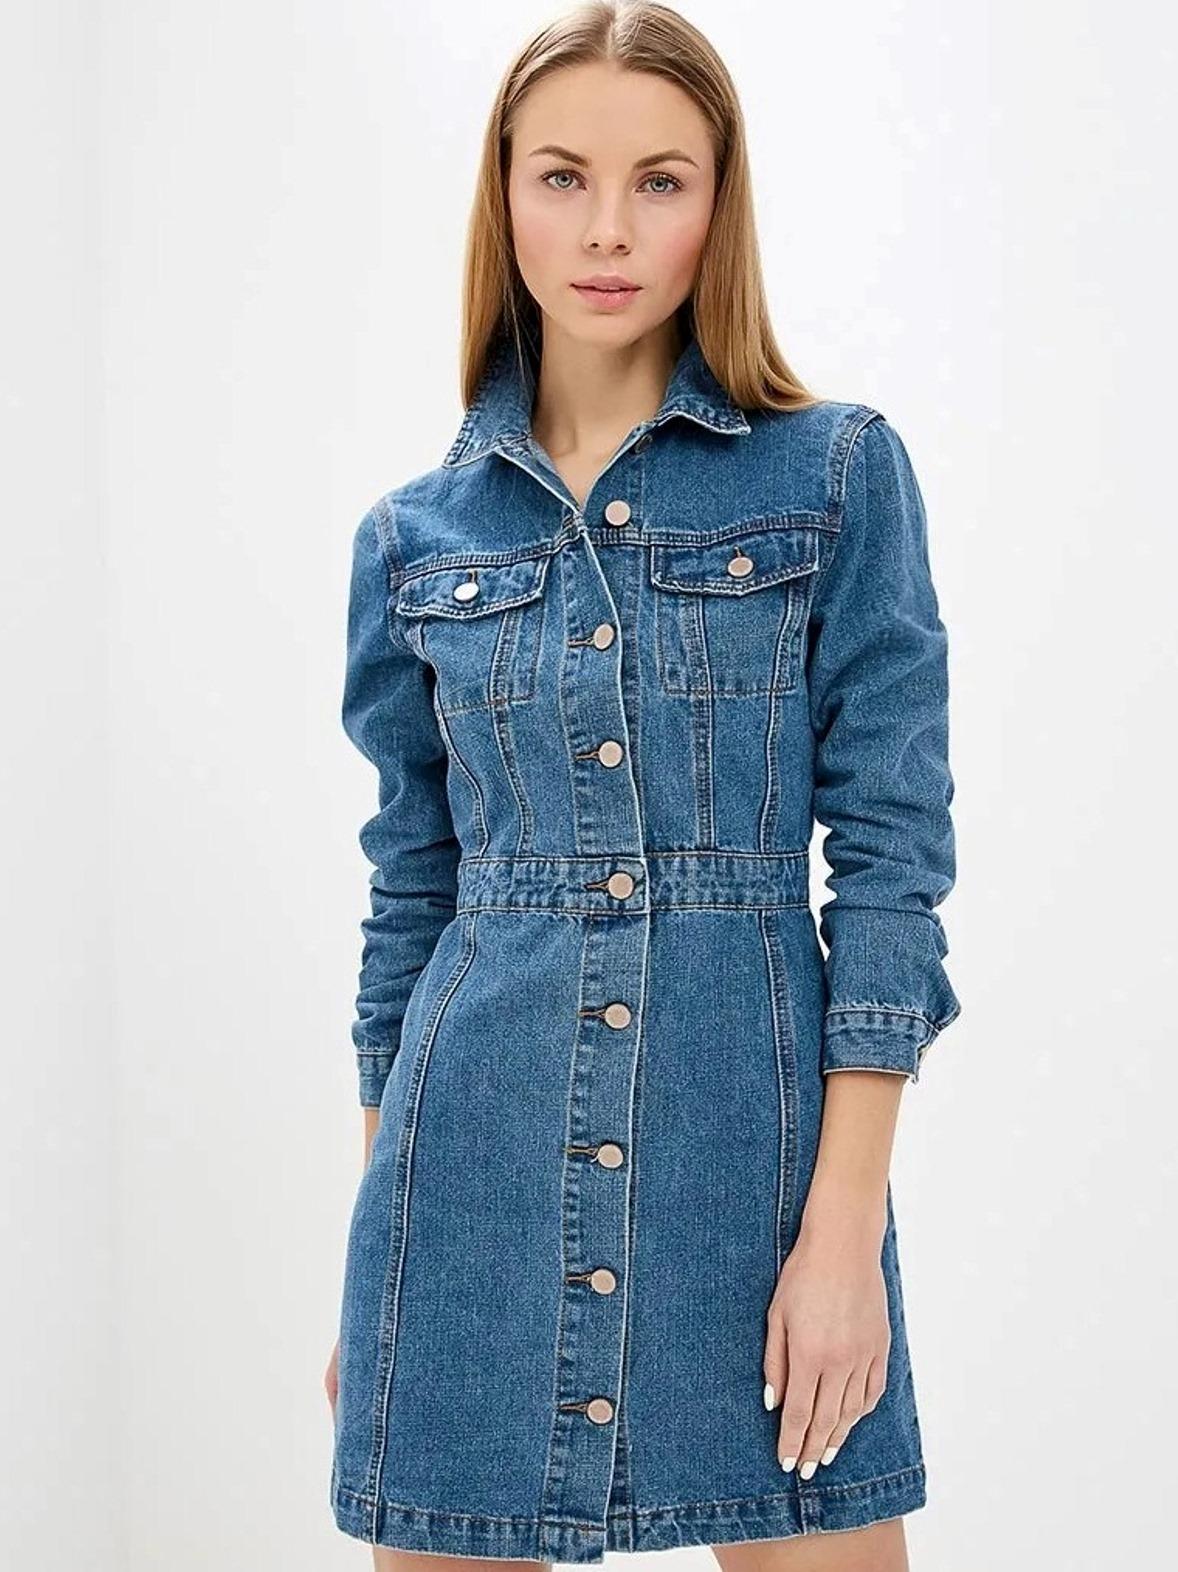 Джинсовое платье Lost Ink 1201115020600025 Синий Free Style